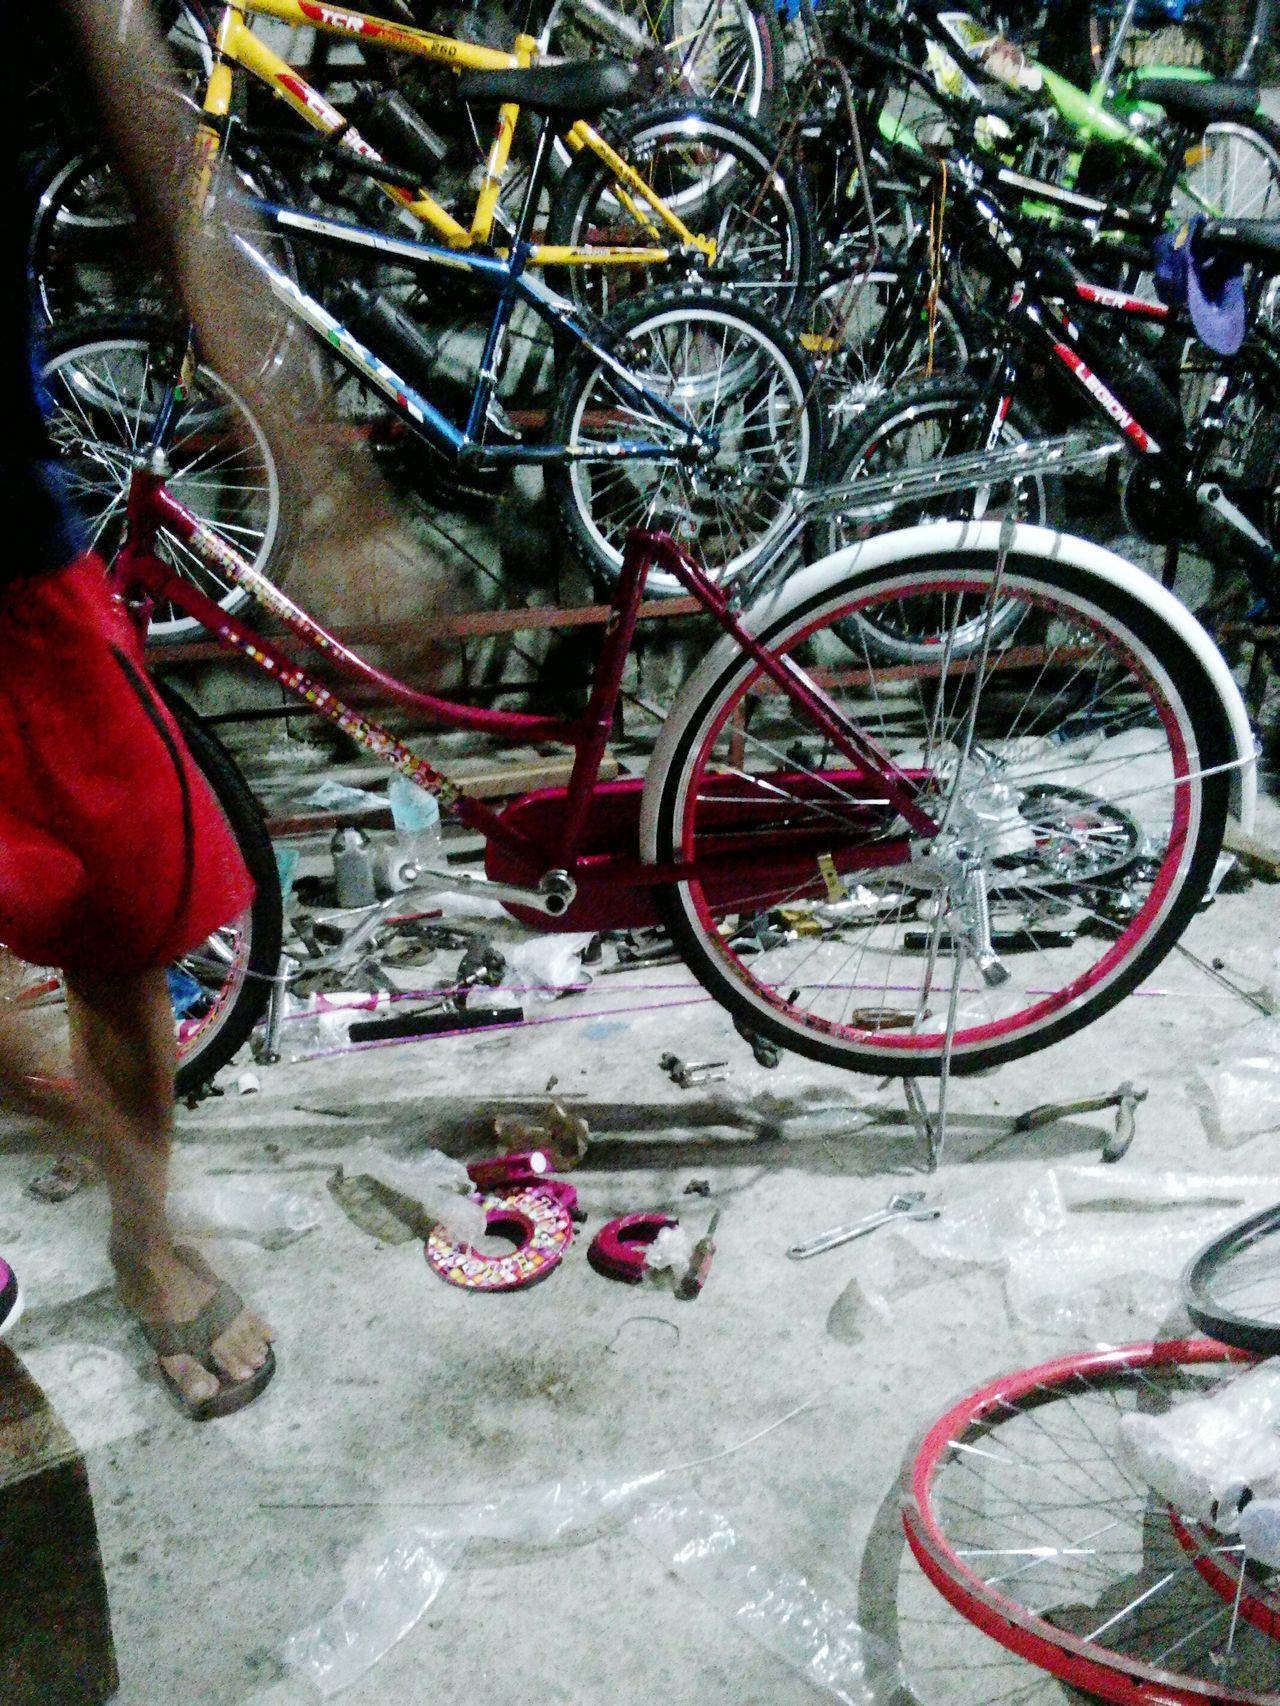 Mode Of Transport Outdoors Japanesebike Assembling CyclingUnites